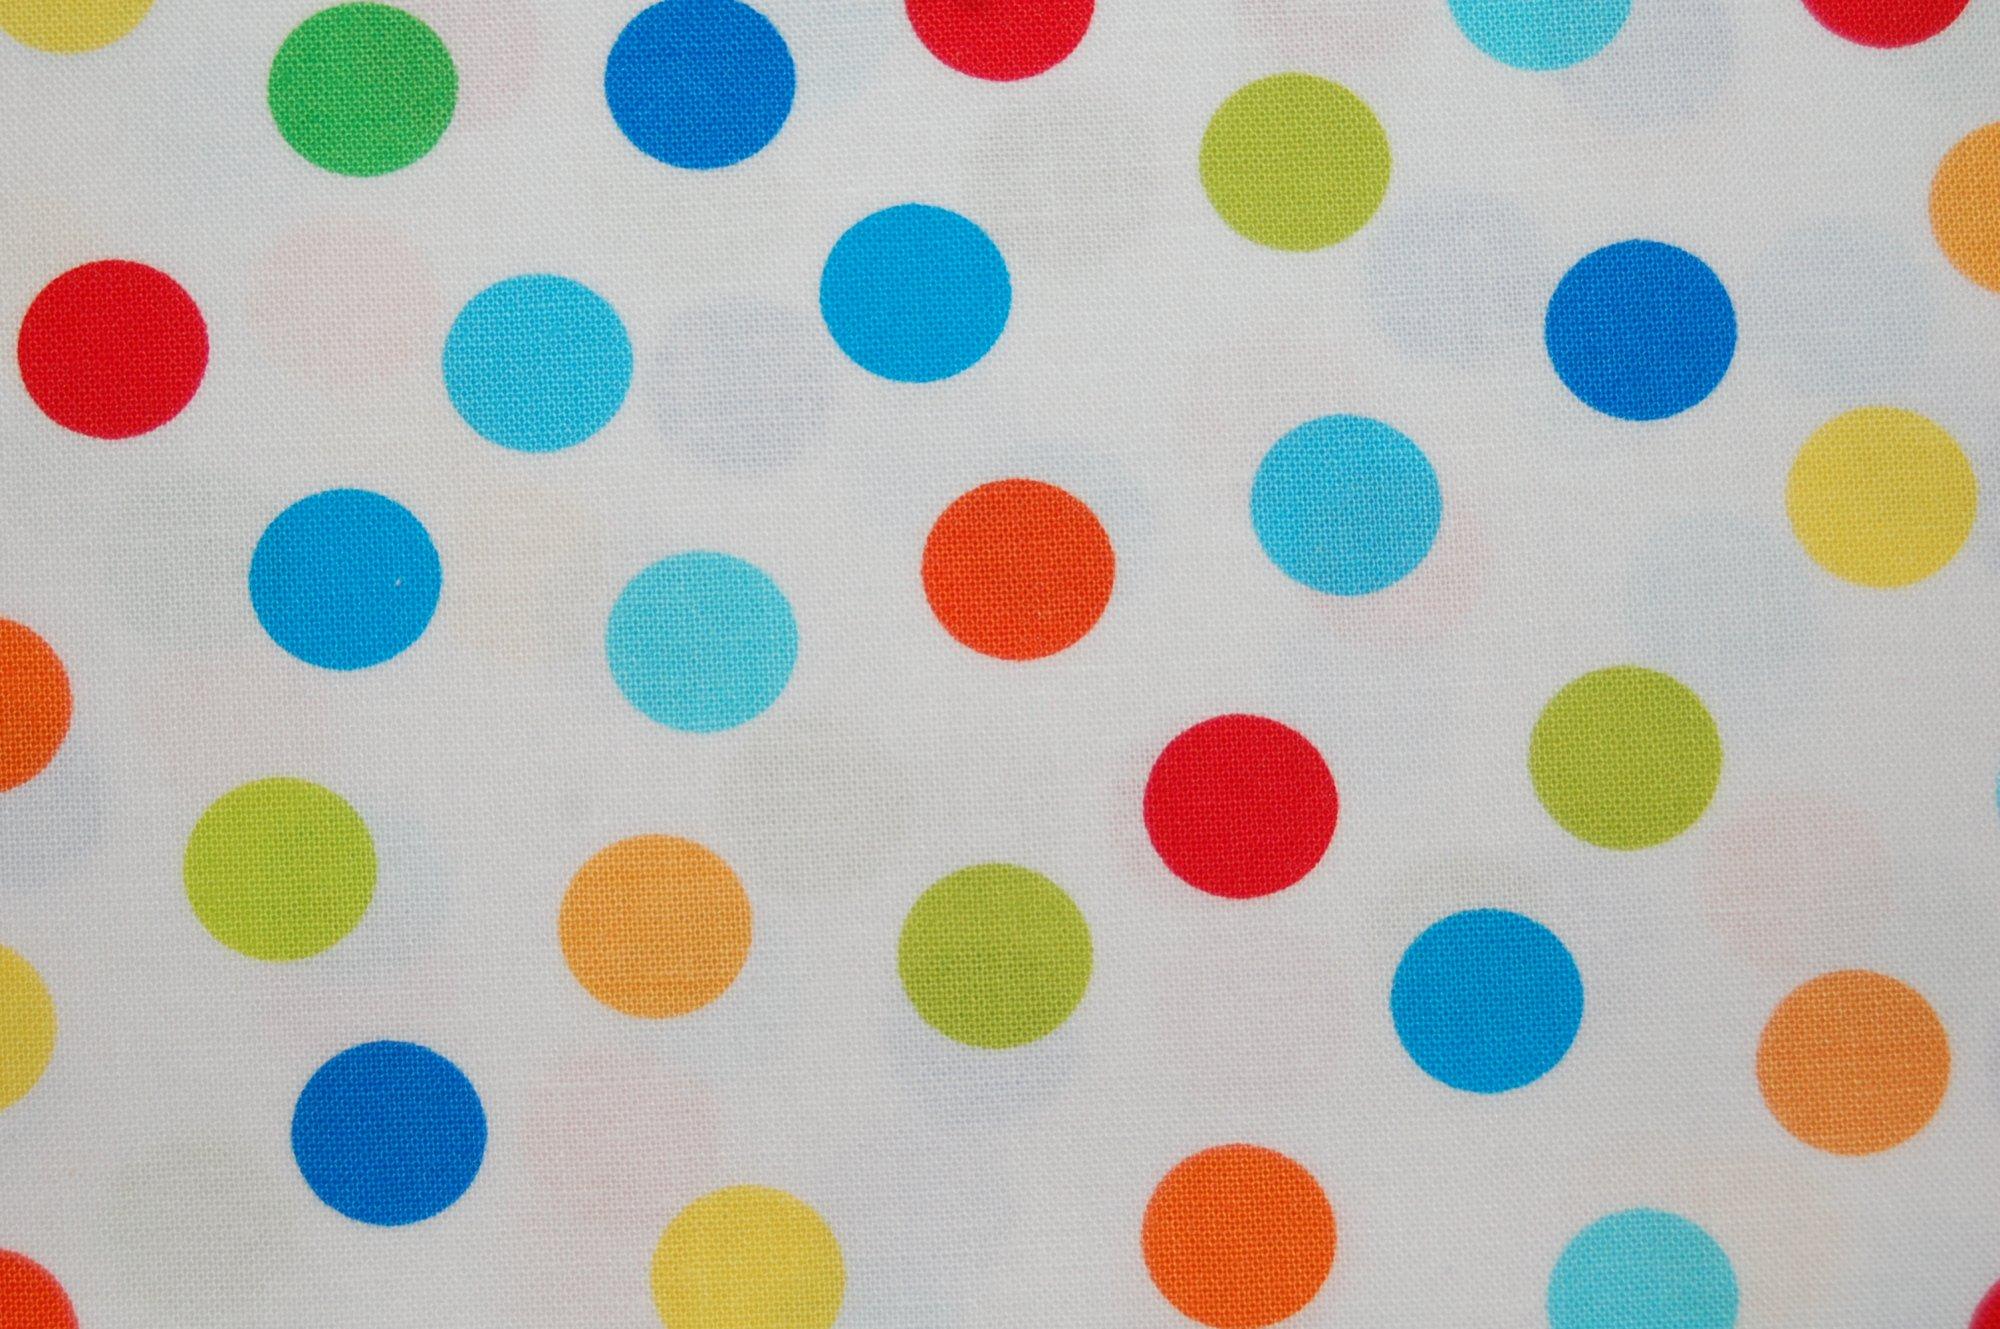 ABC Safari - Dots on White from Diane Eichler for Studio E